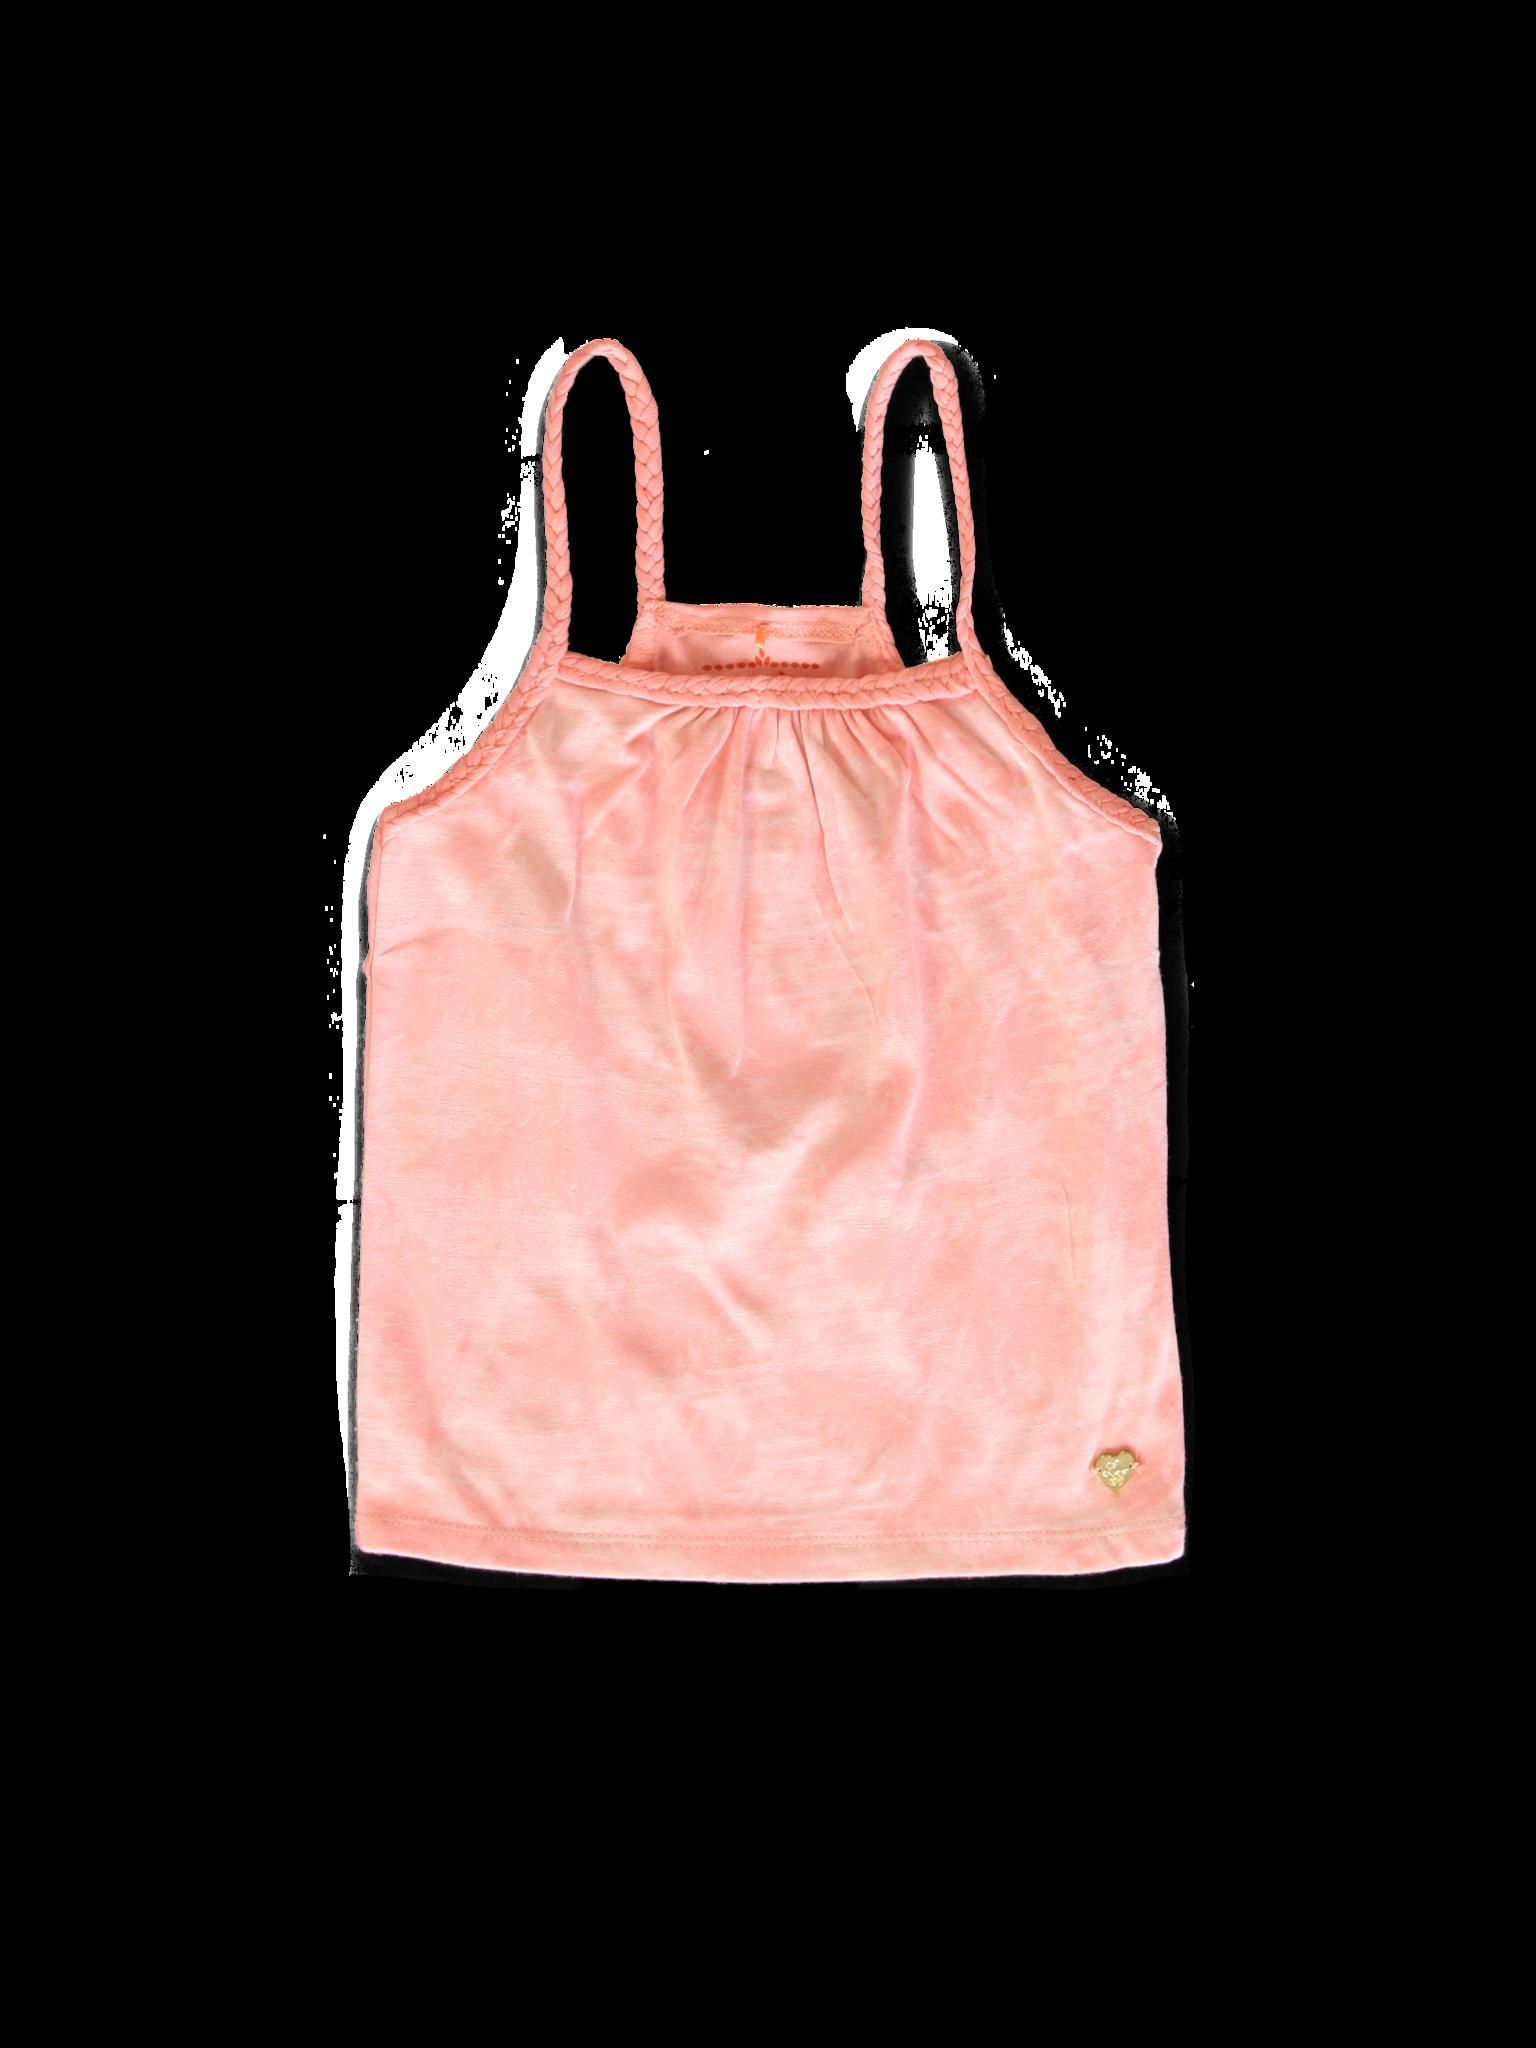 All Brands | Summerproducts Small Girls | Singlet | 12 pcs/box